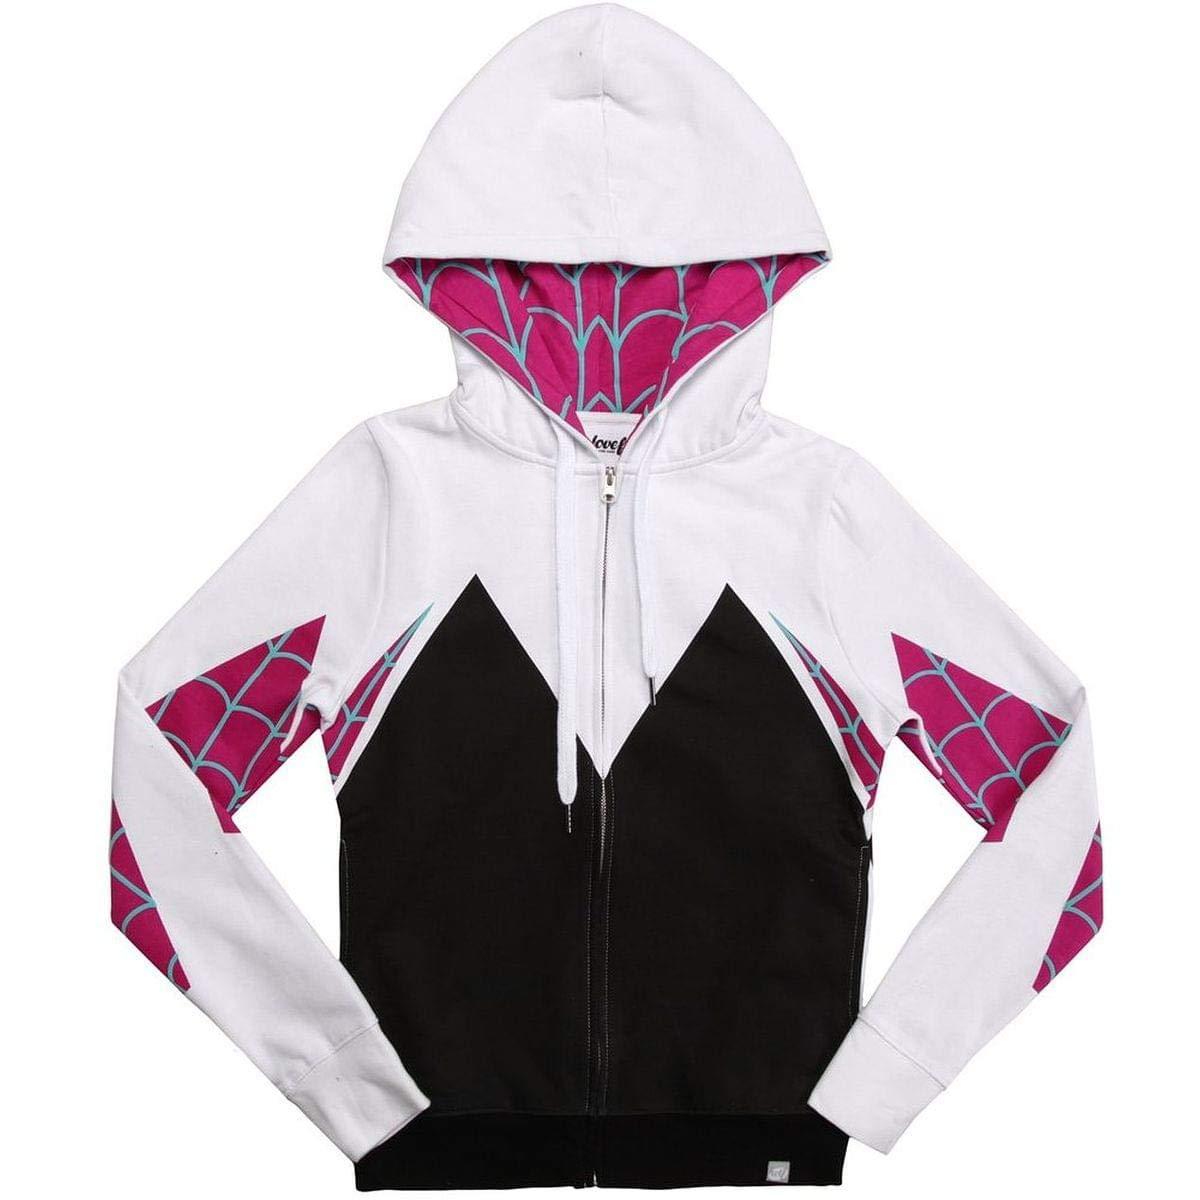 9ec6cf59e28 Mighty Fine Girls Womens I Am Spider-Gwen Hoodie X-Large: Amazon.co ...